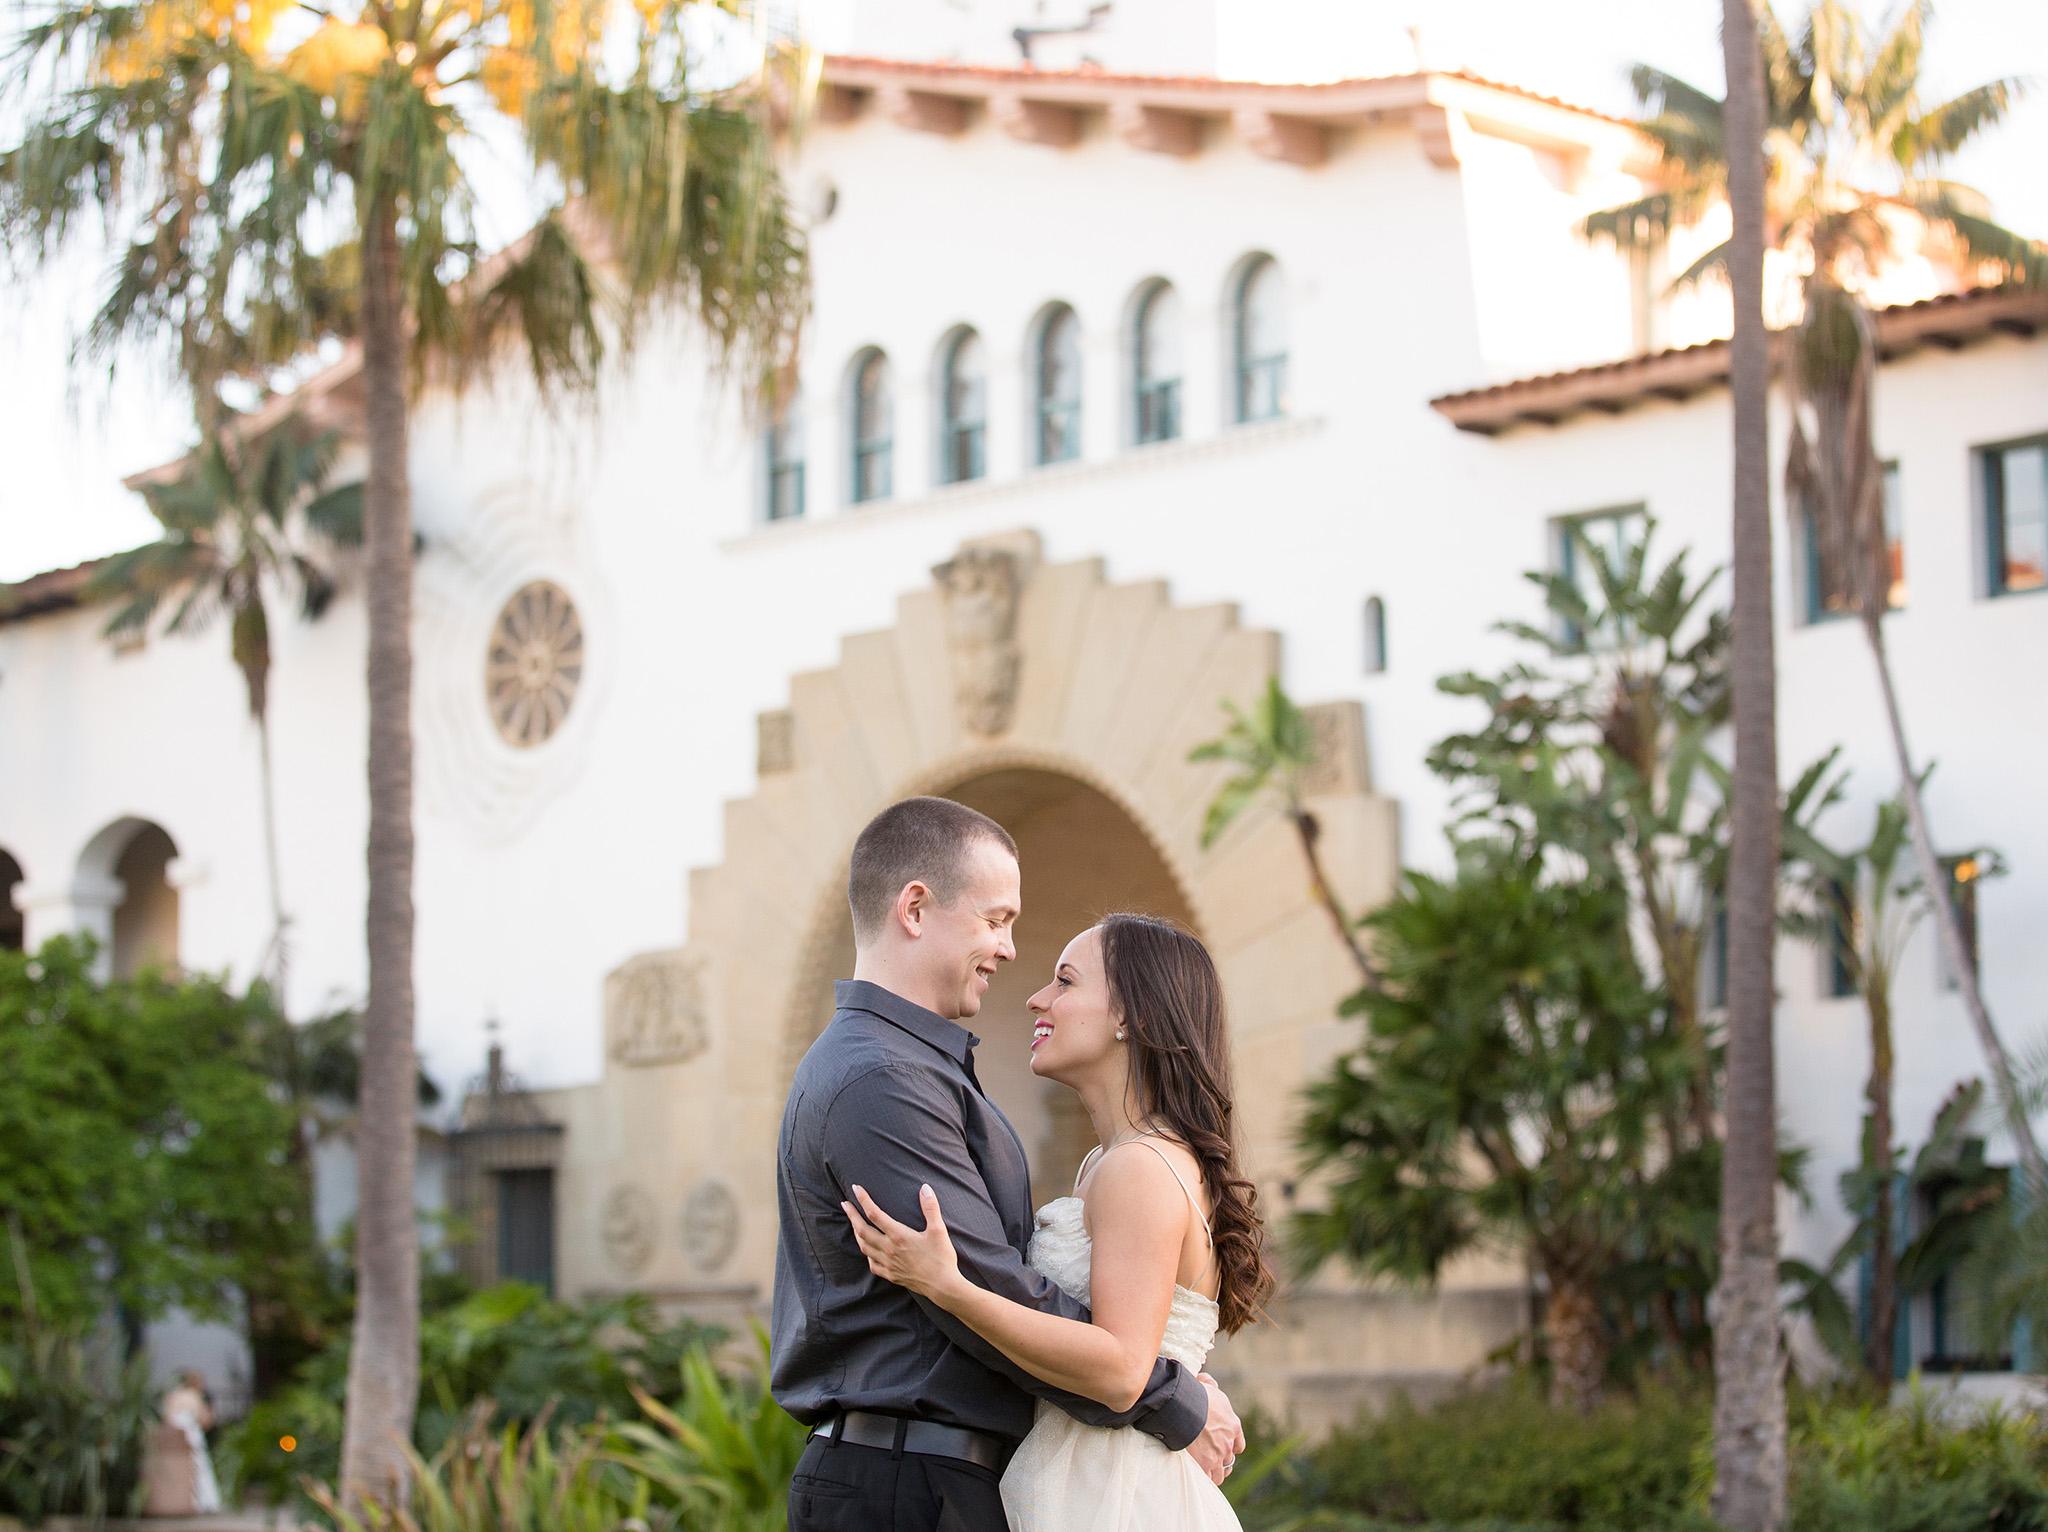 EngagementSessionPhotography_MichelleGirard04.jpg